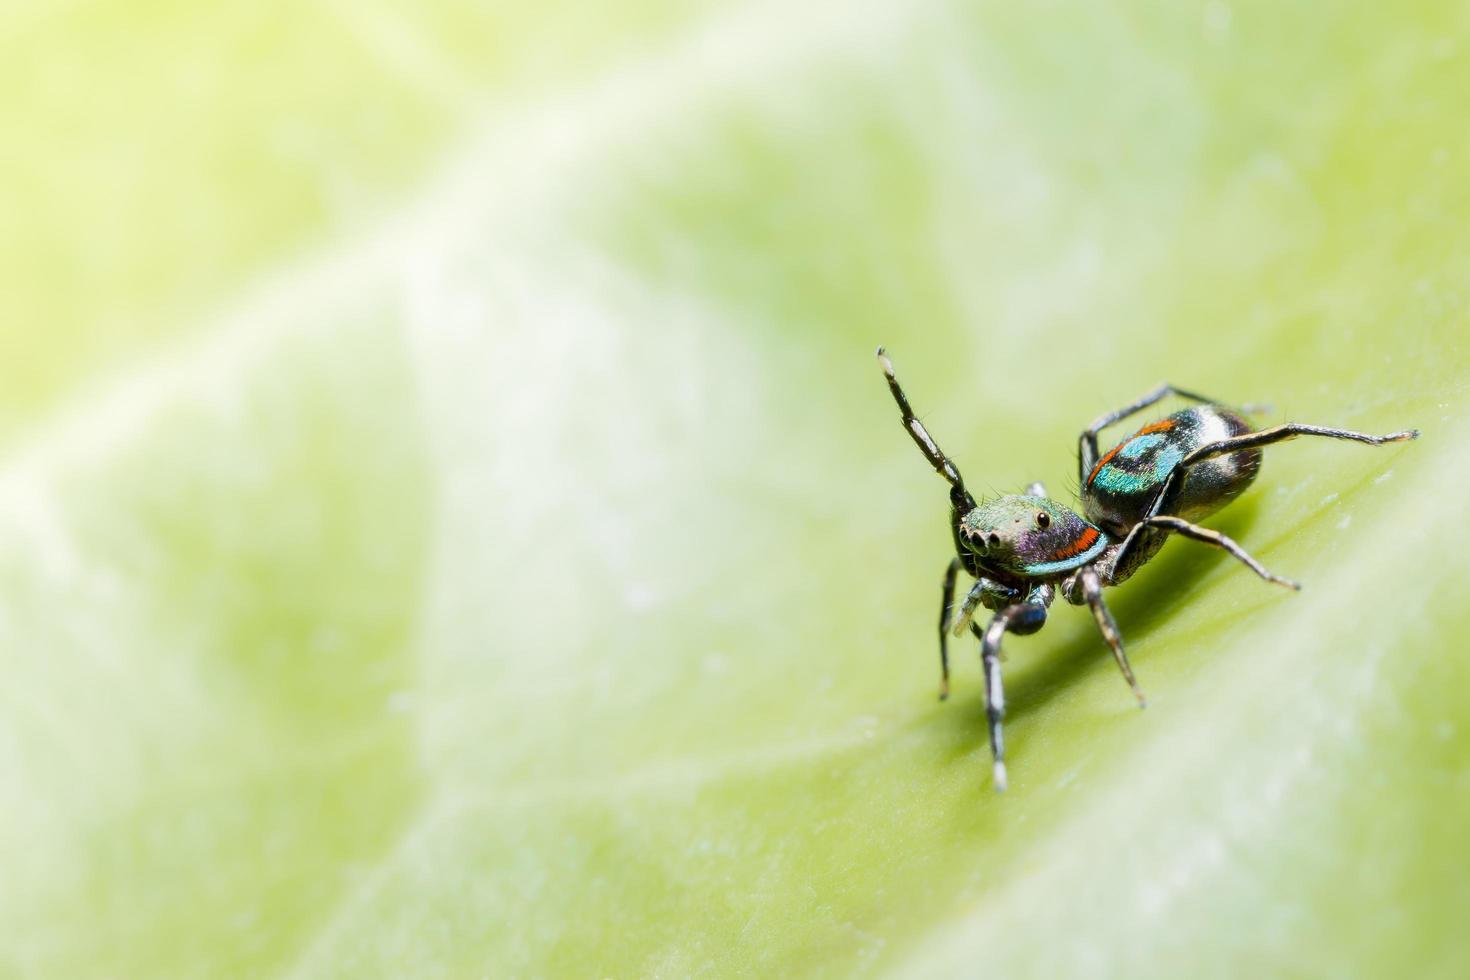 araña en hoja verde foto